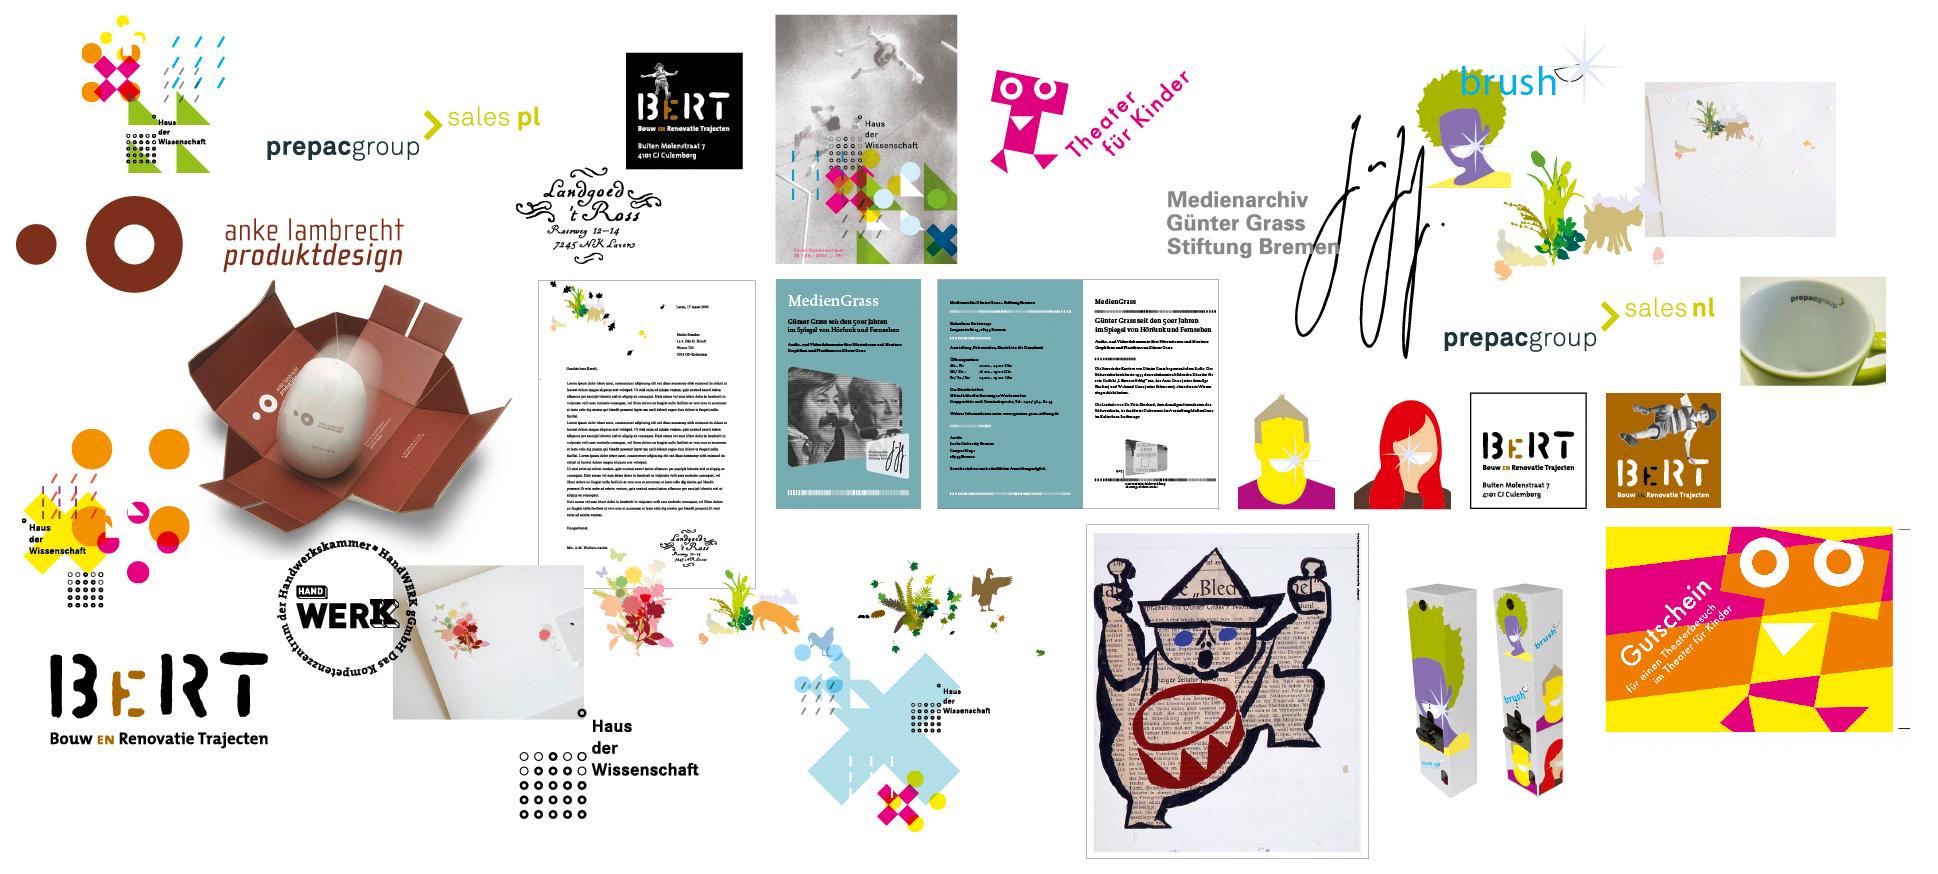 Creativejuice andrea for Produktdesign bremen